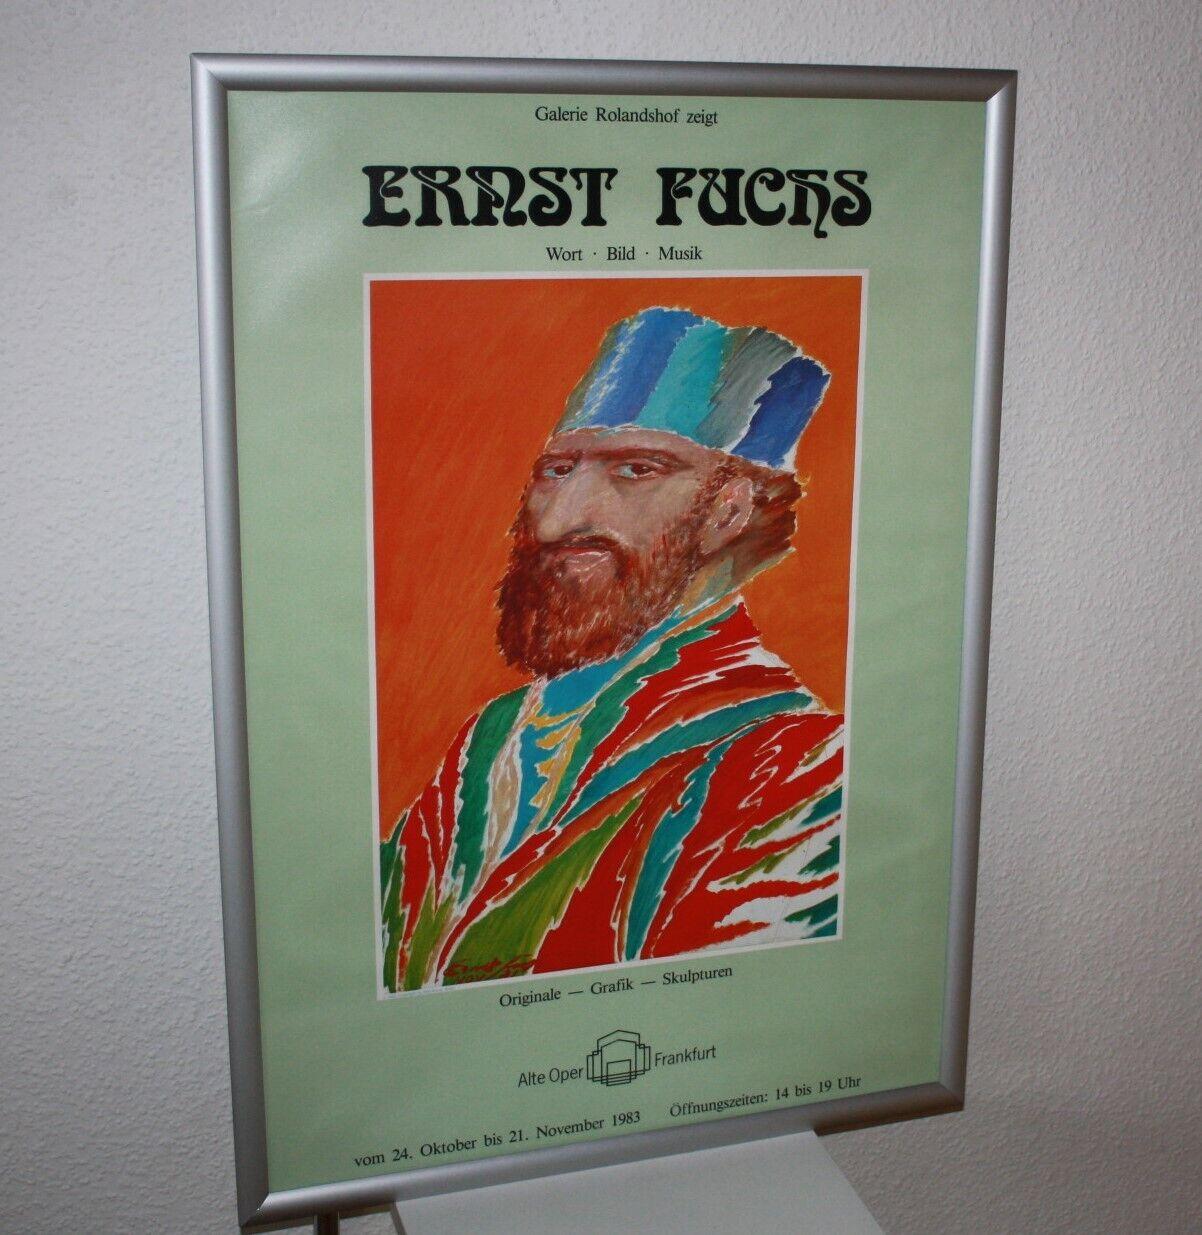 Ernst Fuchs  Grafik Skulpturen Musik Wort Bild 1983 Poster